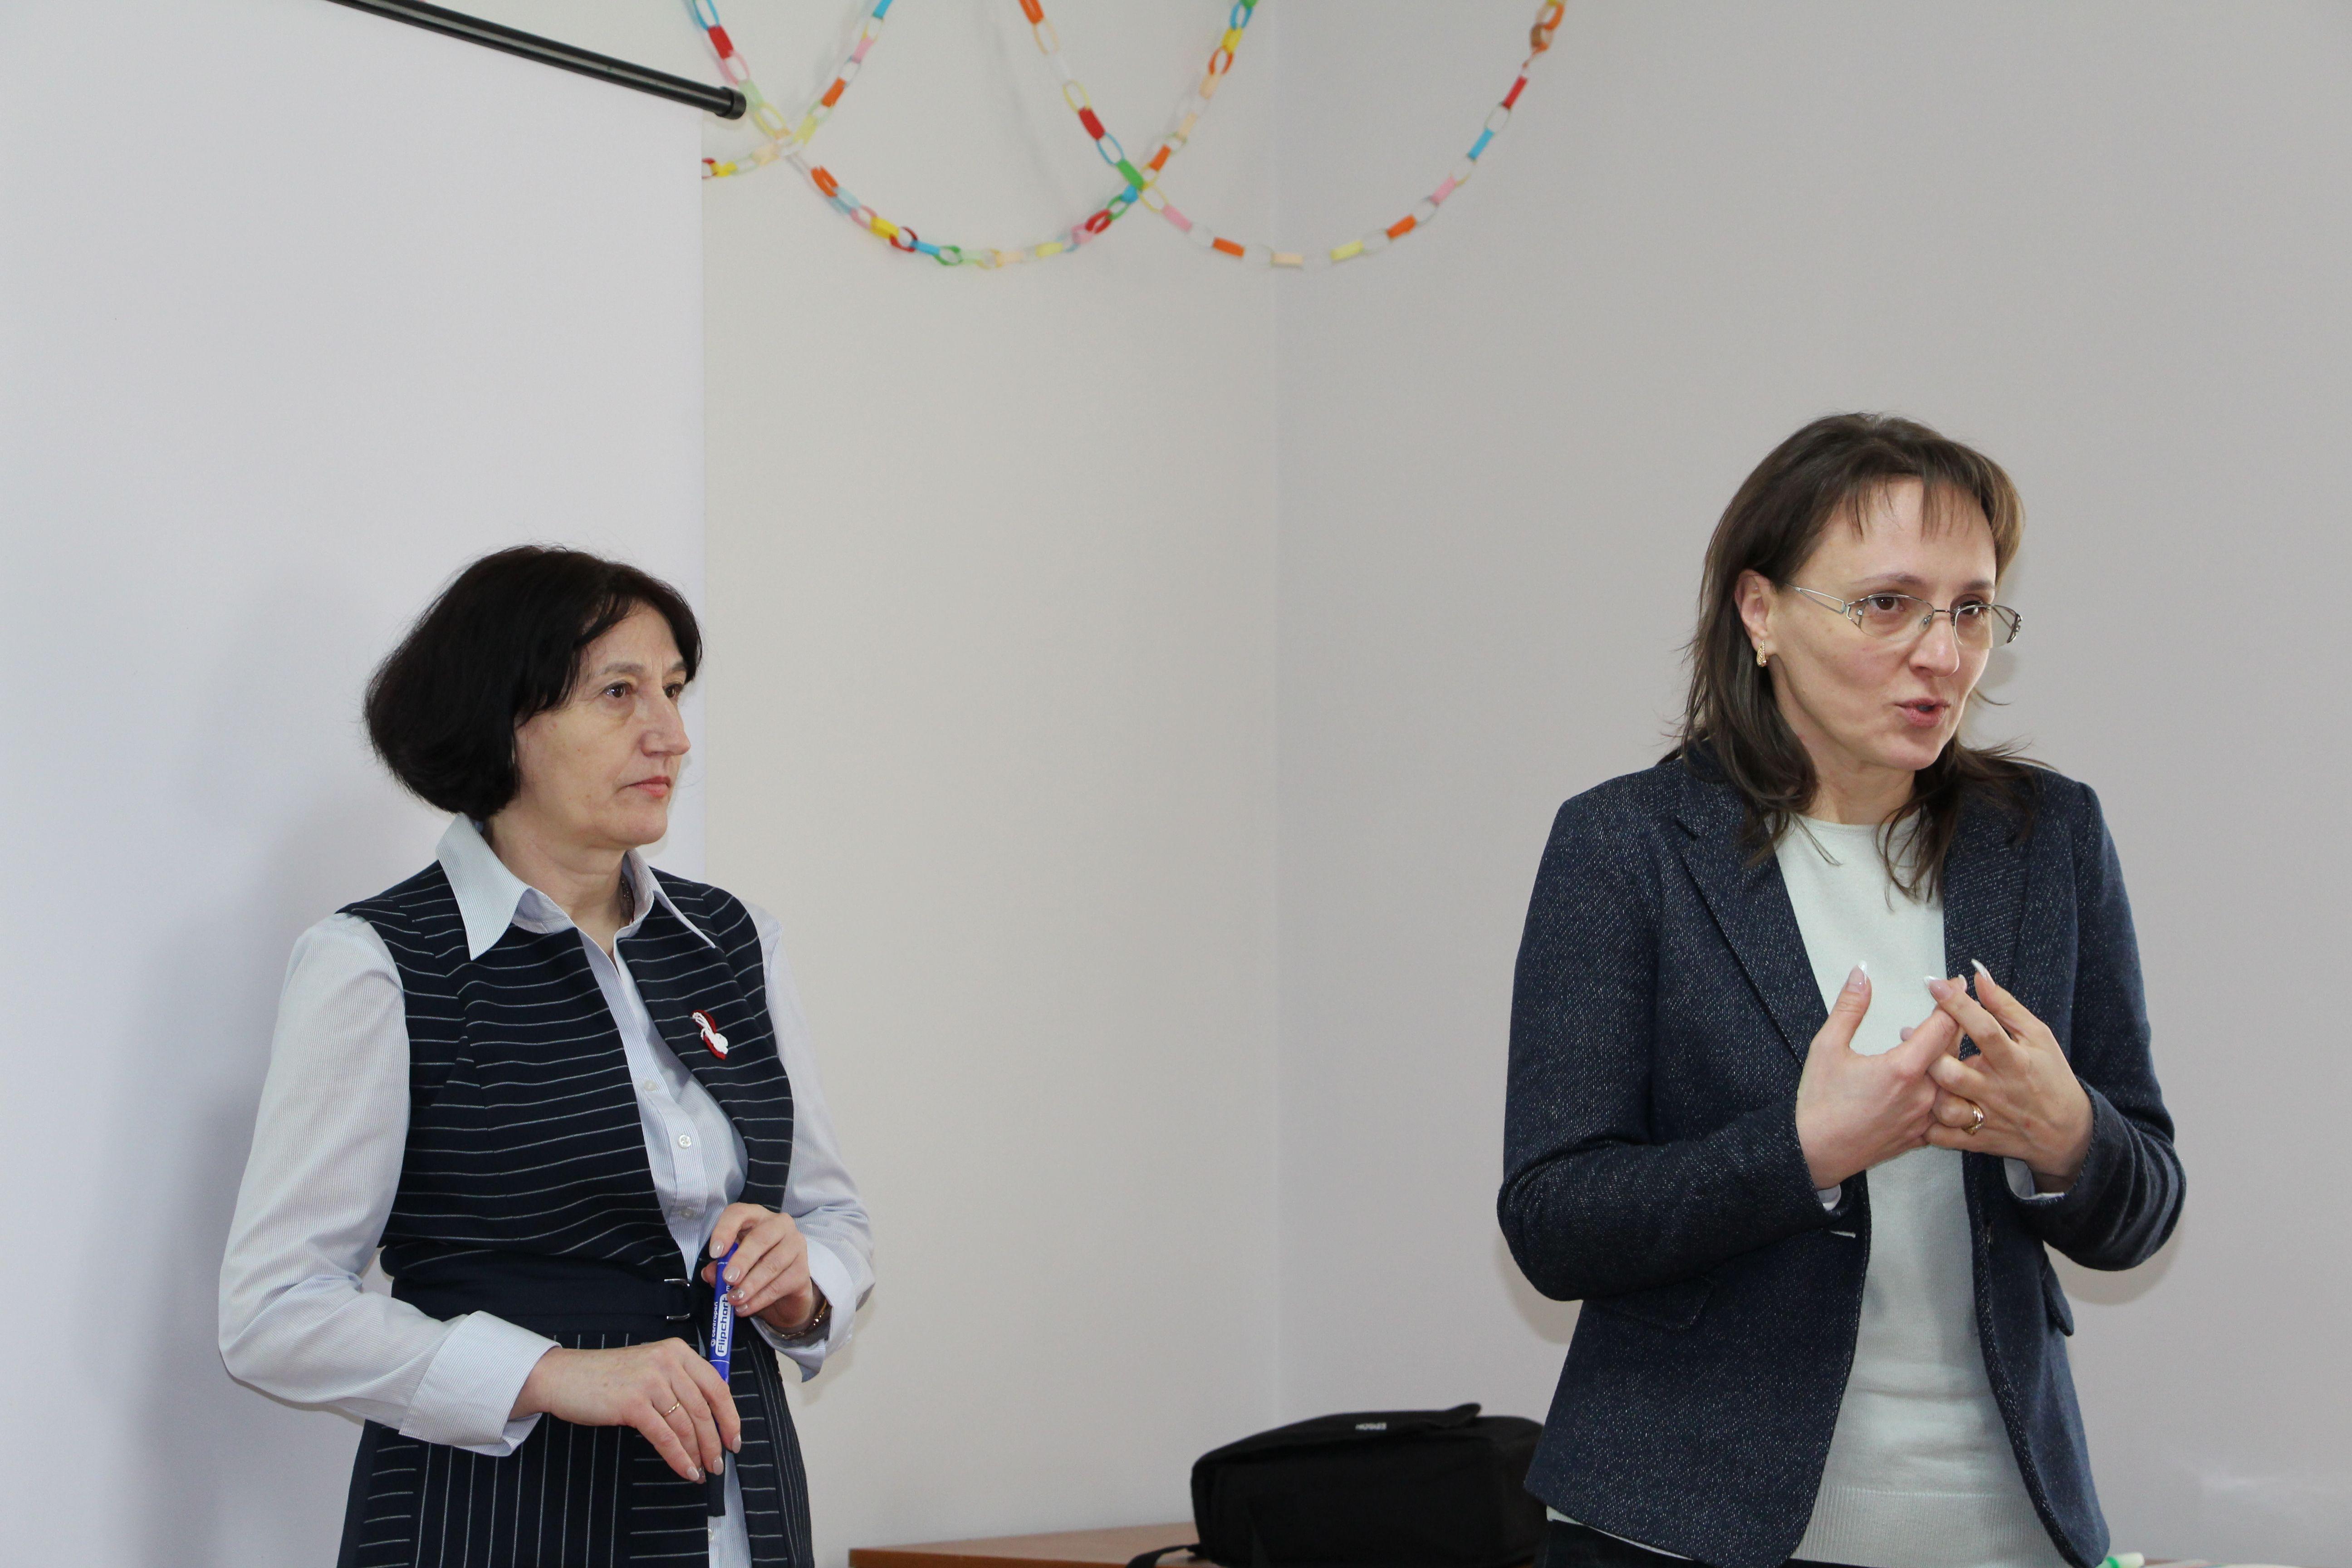 В Комрате прошел семинар на тему «Технология ведения тренинга»